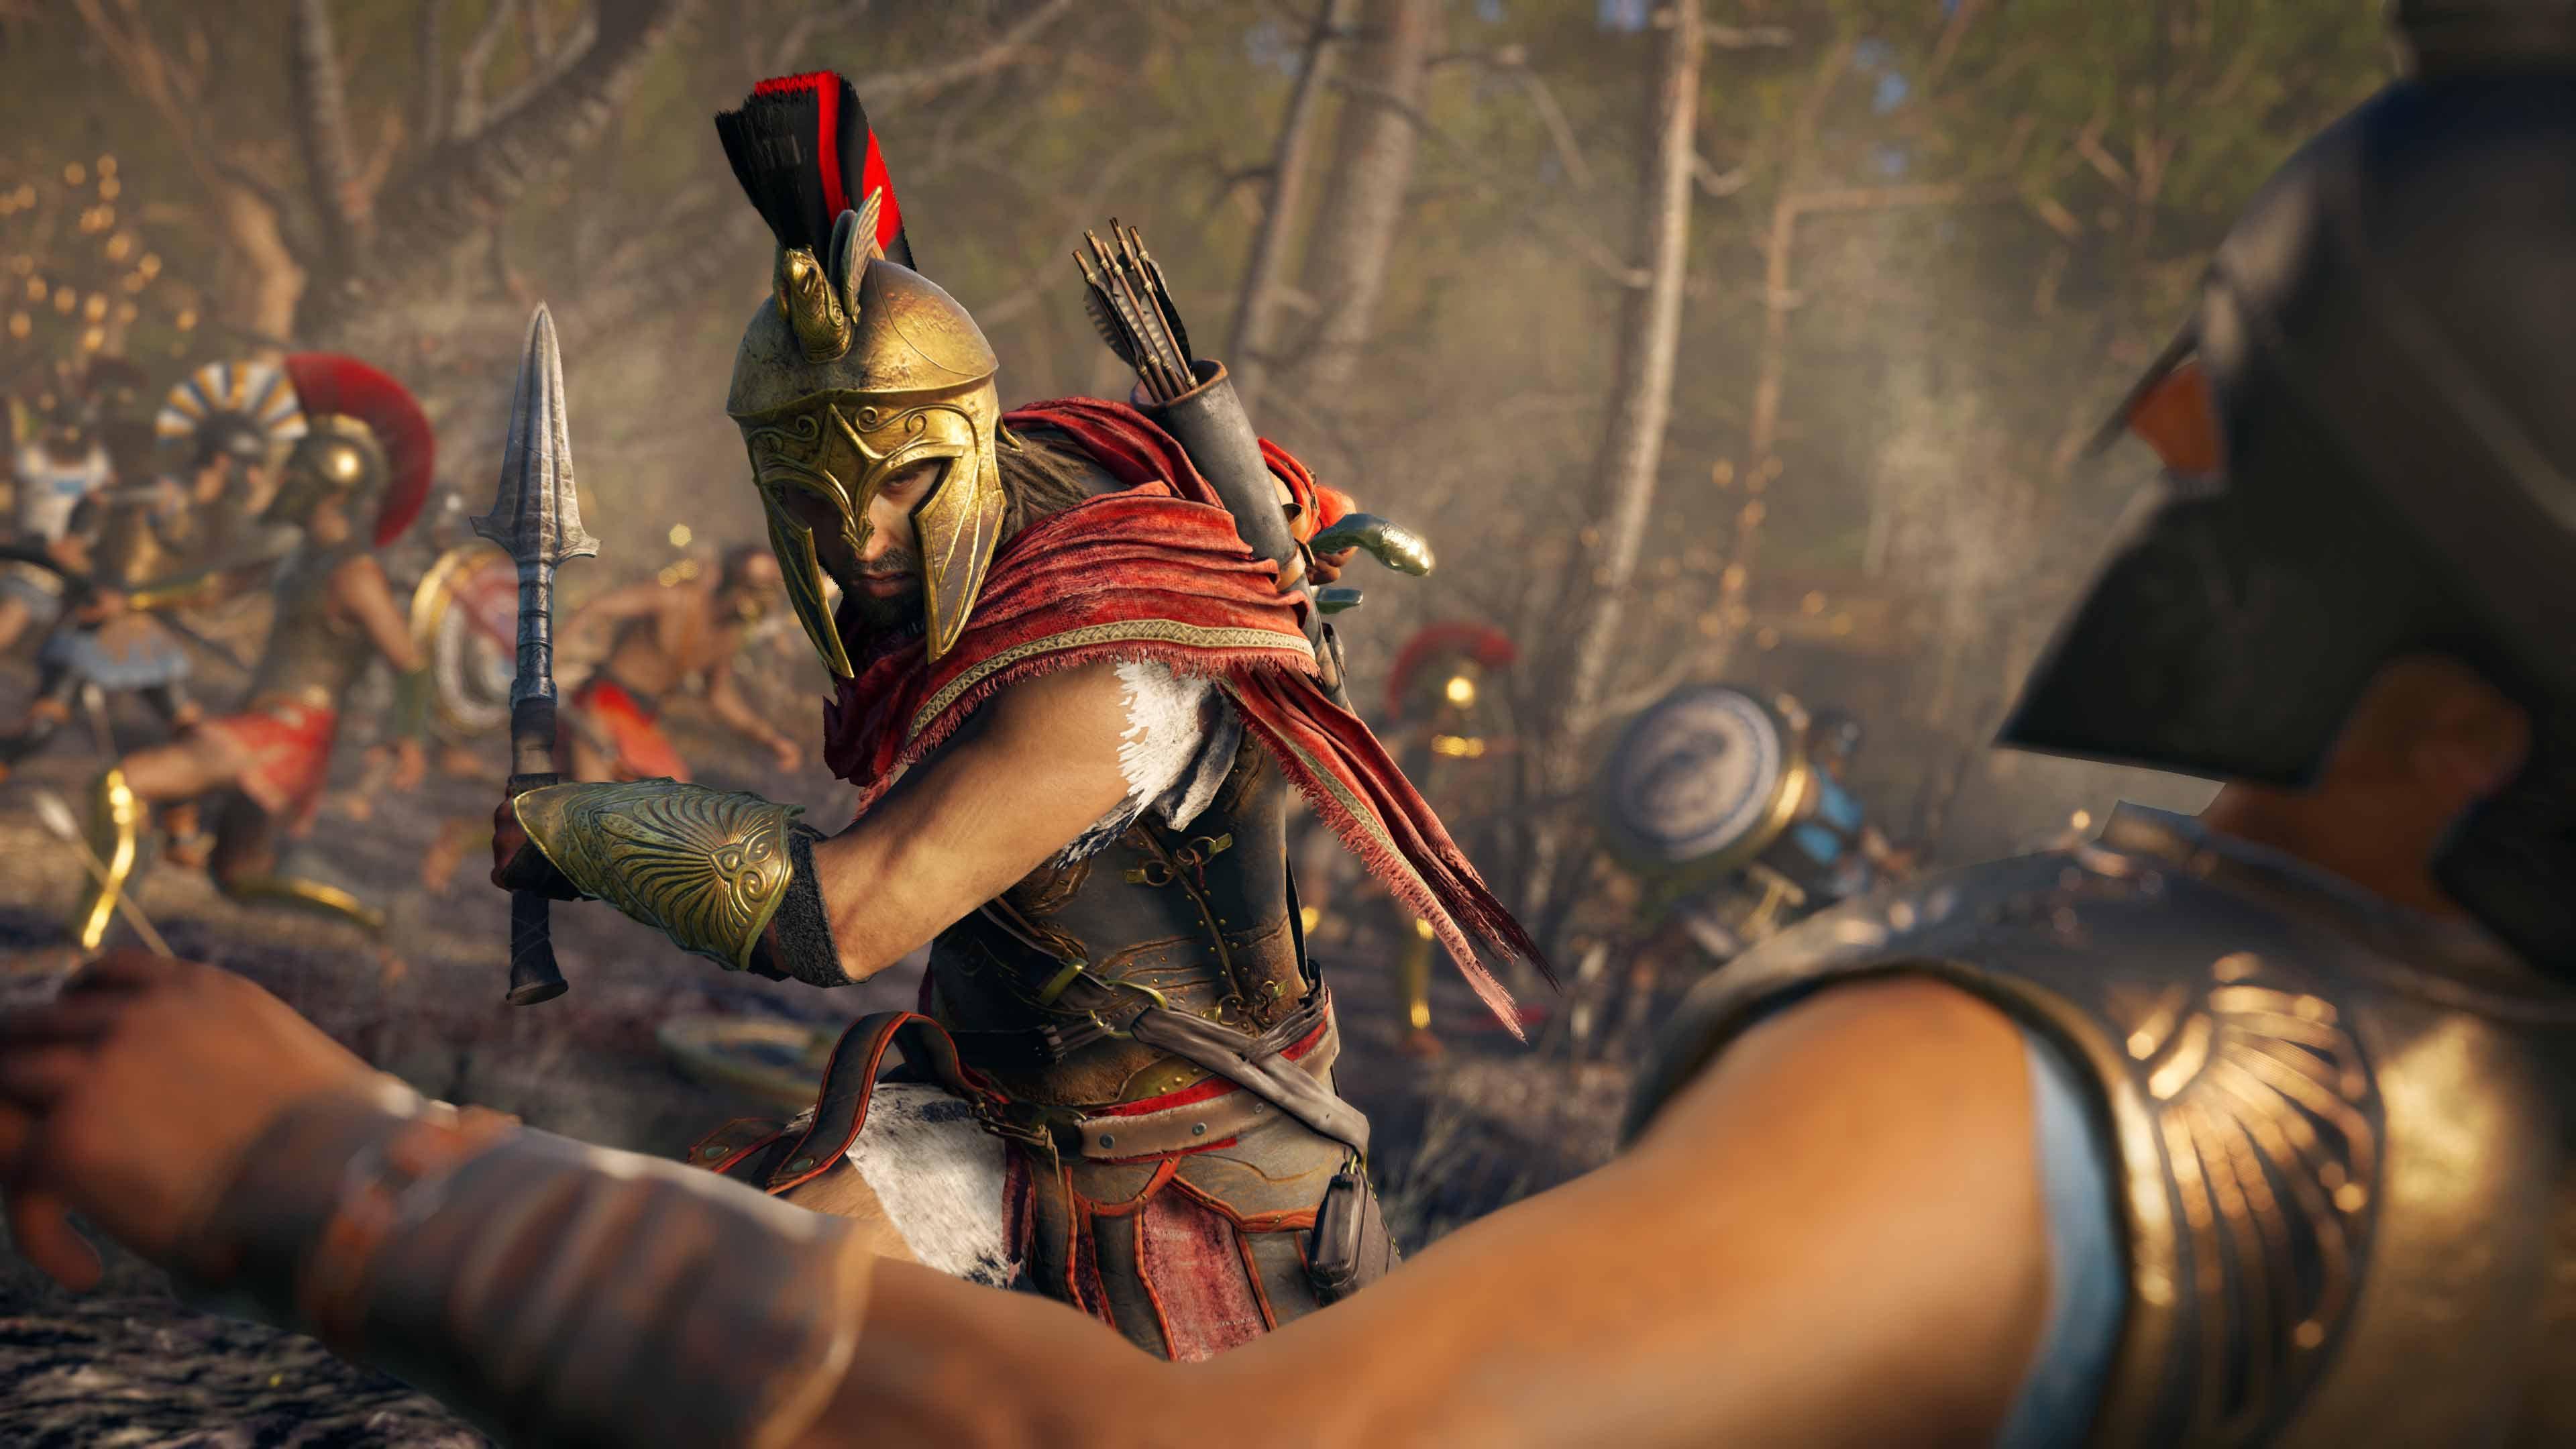 Assassins_Creed_Odyssey_screen_AlexiosEpicBattle_E3_110618_230pm_1528723937